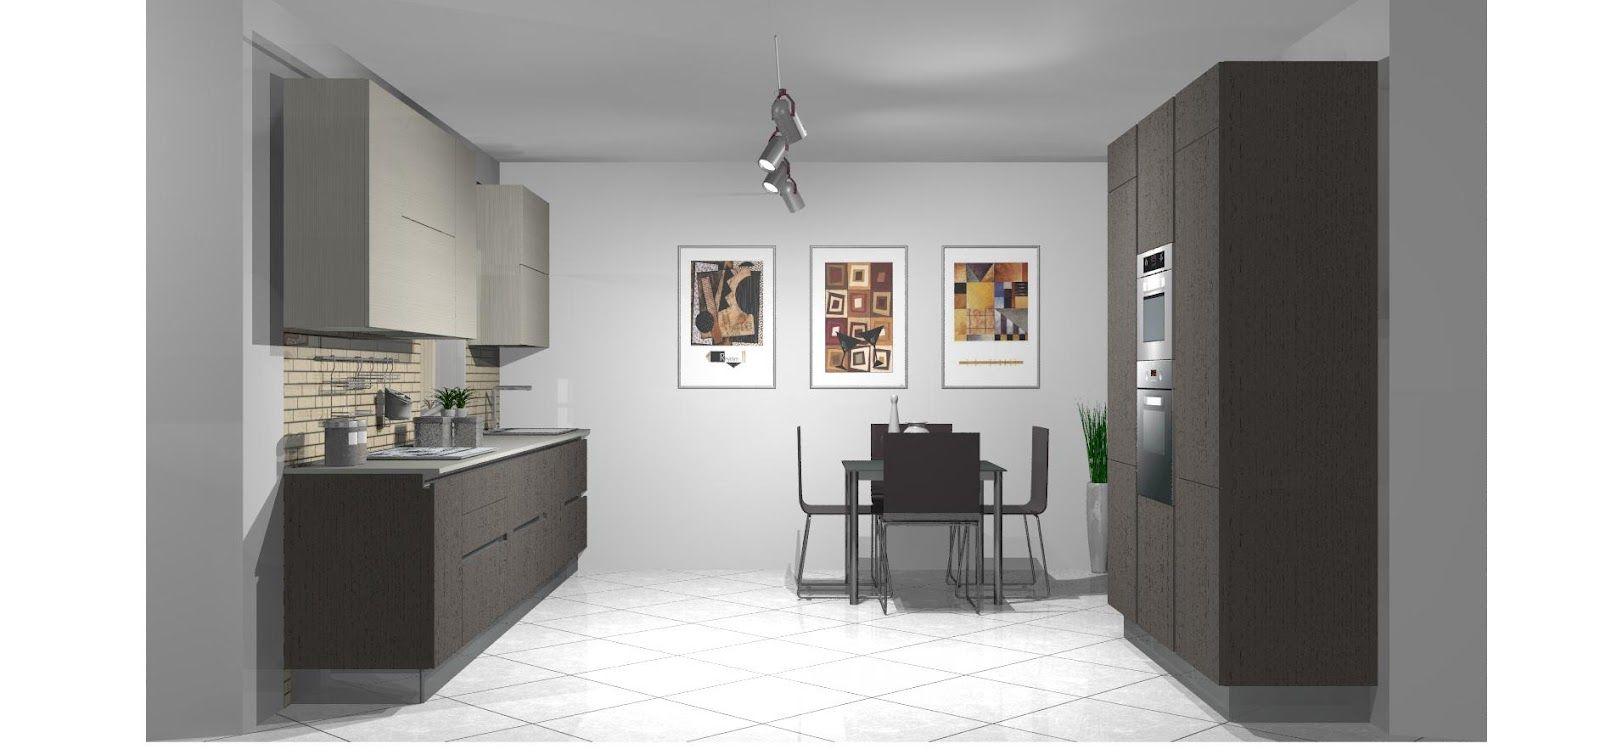 cucina due pareti | Mobili | Cucine, Arredamento e Idee per ...